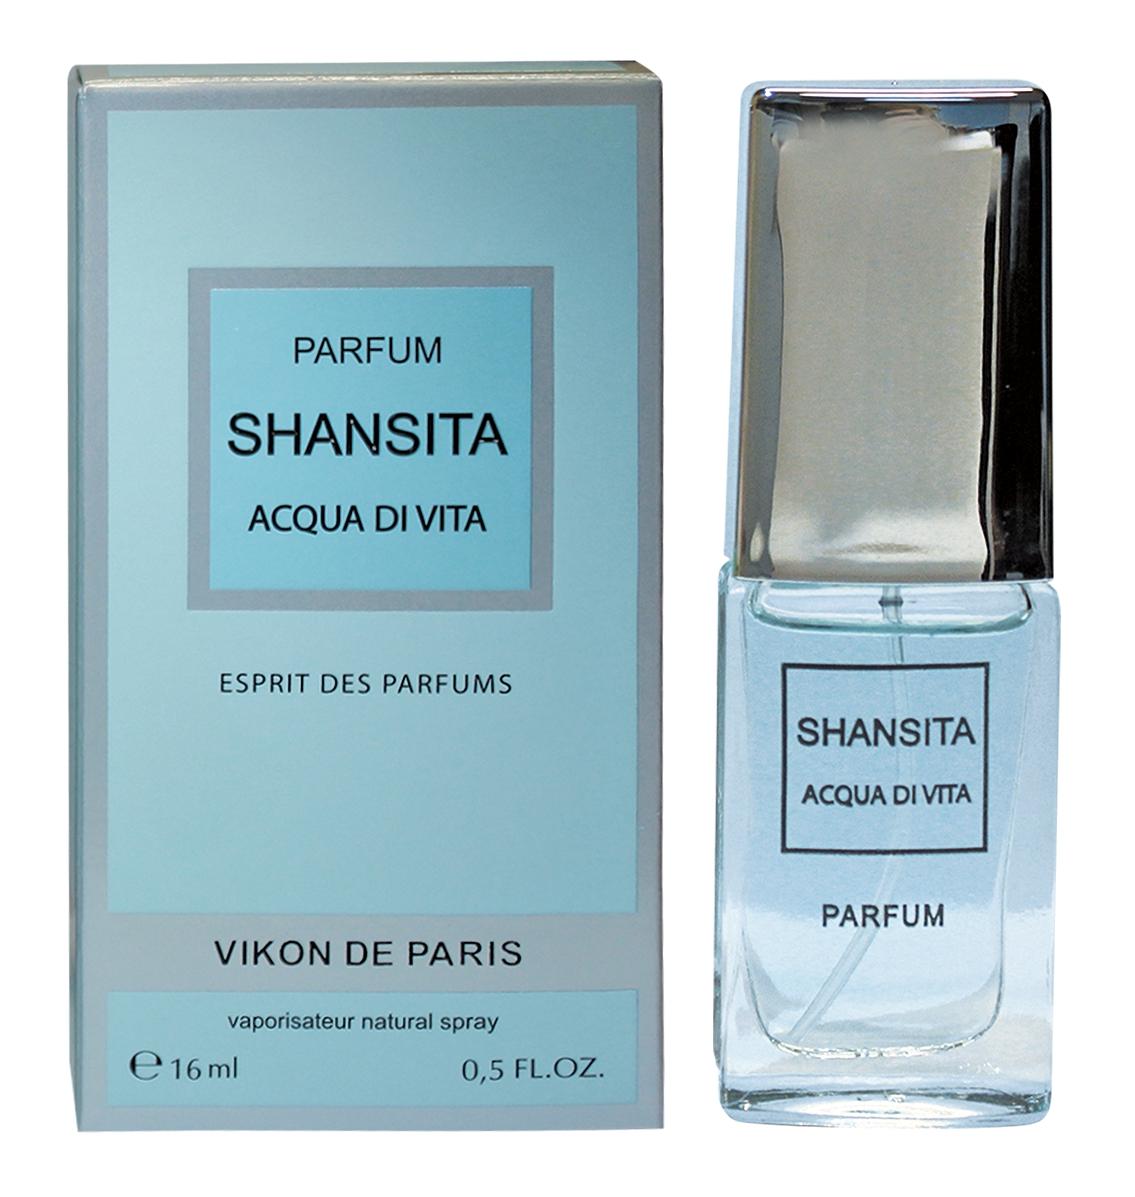 женская парфюмерная вода   Дух Духов  Шансита Acqua di Vita  50 мл.